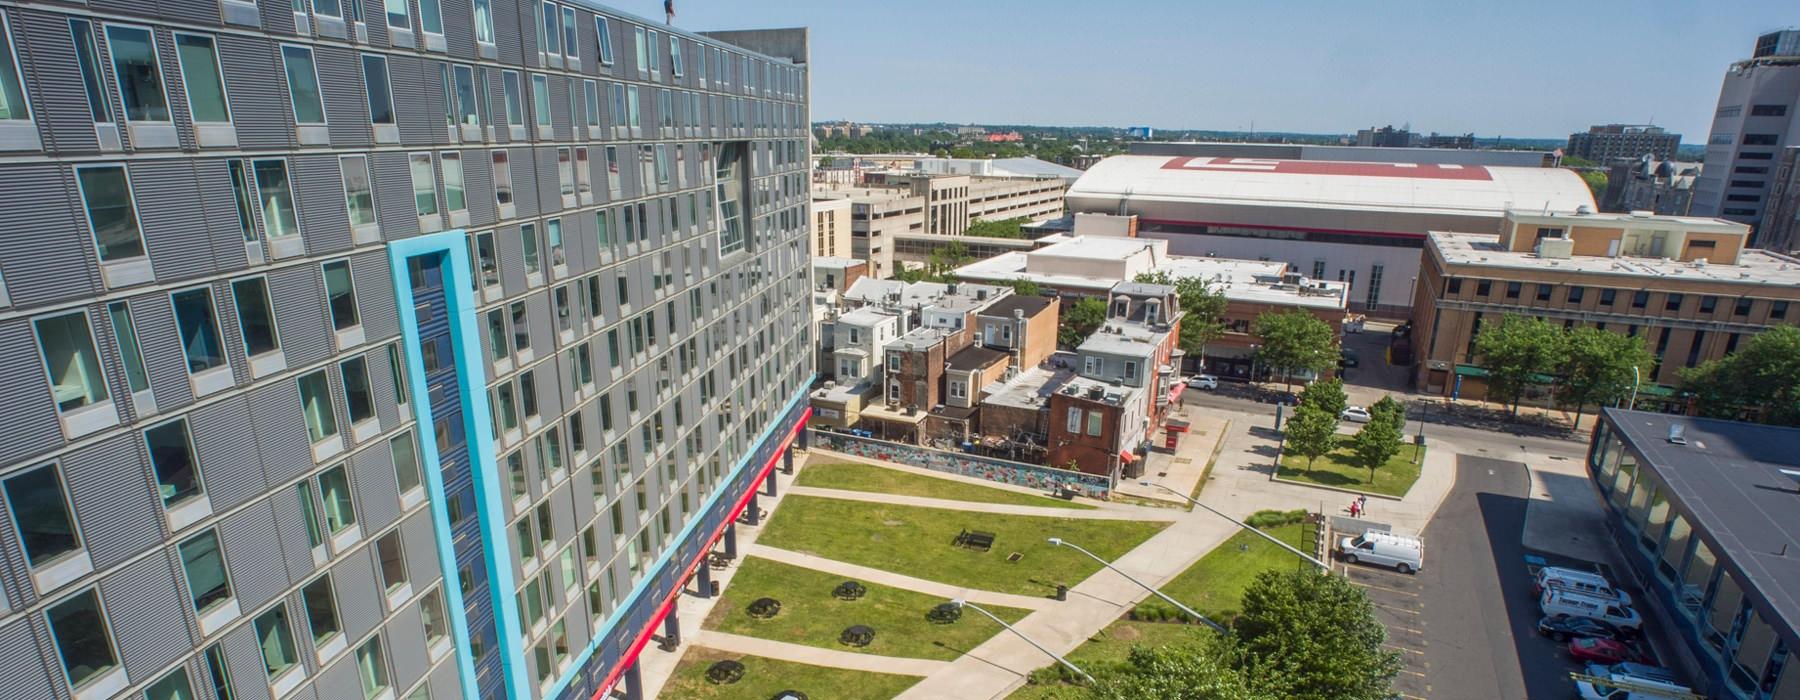 The Edge Student Village exterior